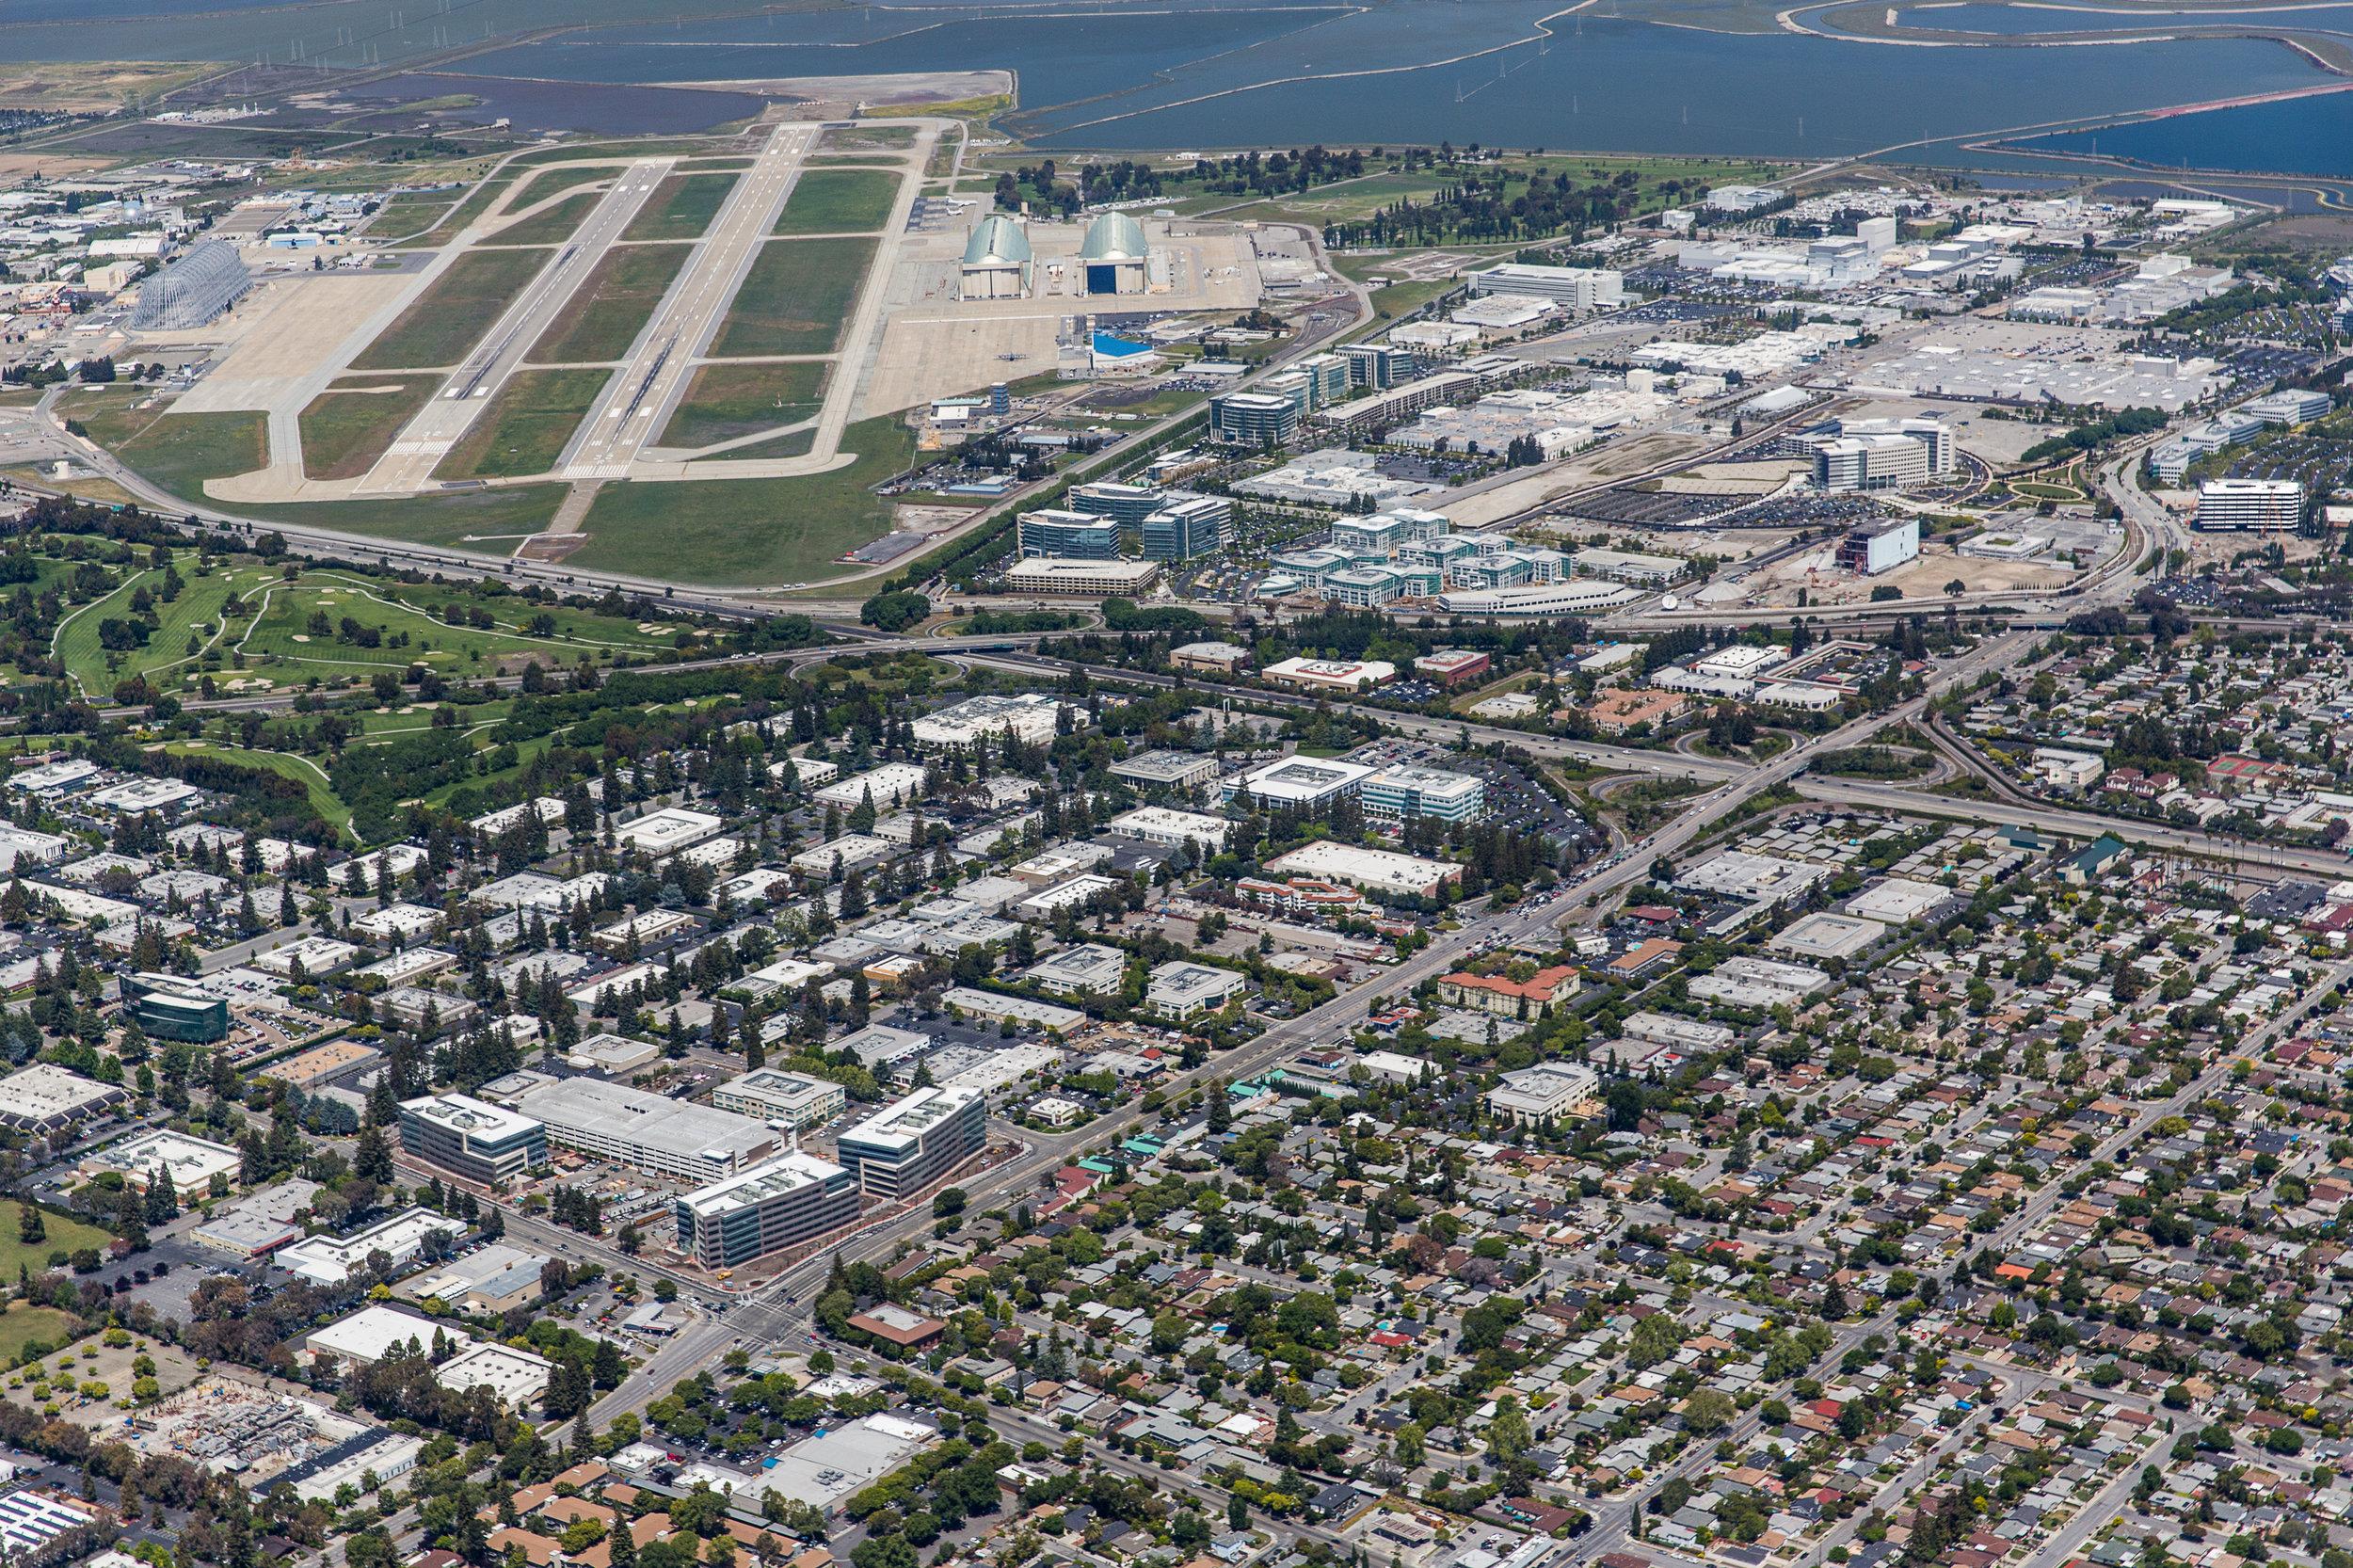 Aerial - Wide View_K1A1652.jpg